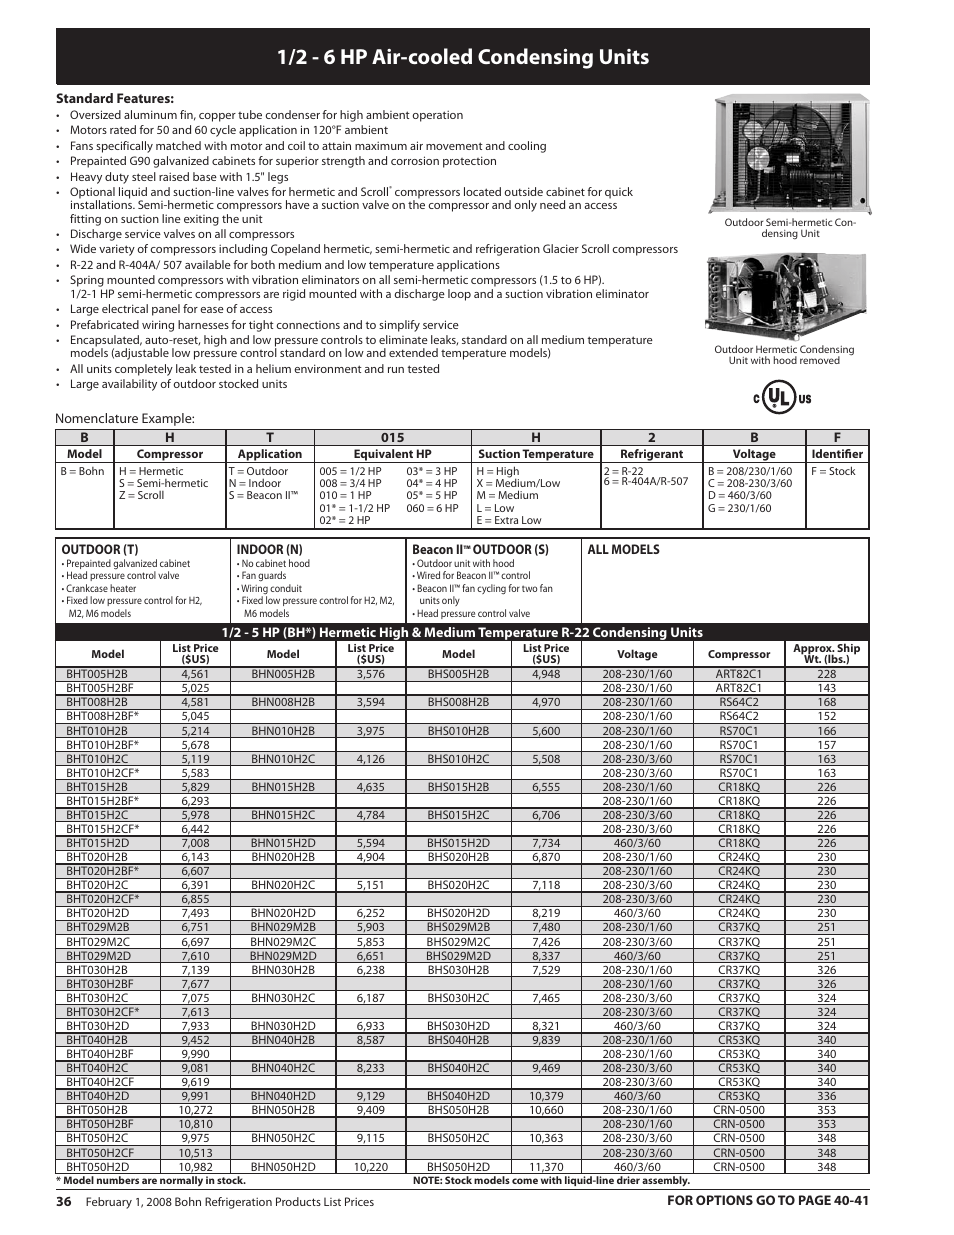 Tyler Refrigeration Manuals Wiring Diagrams